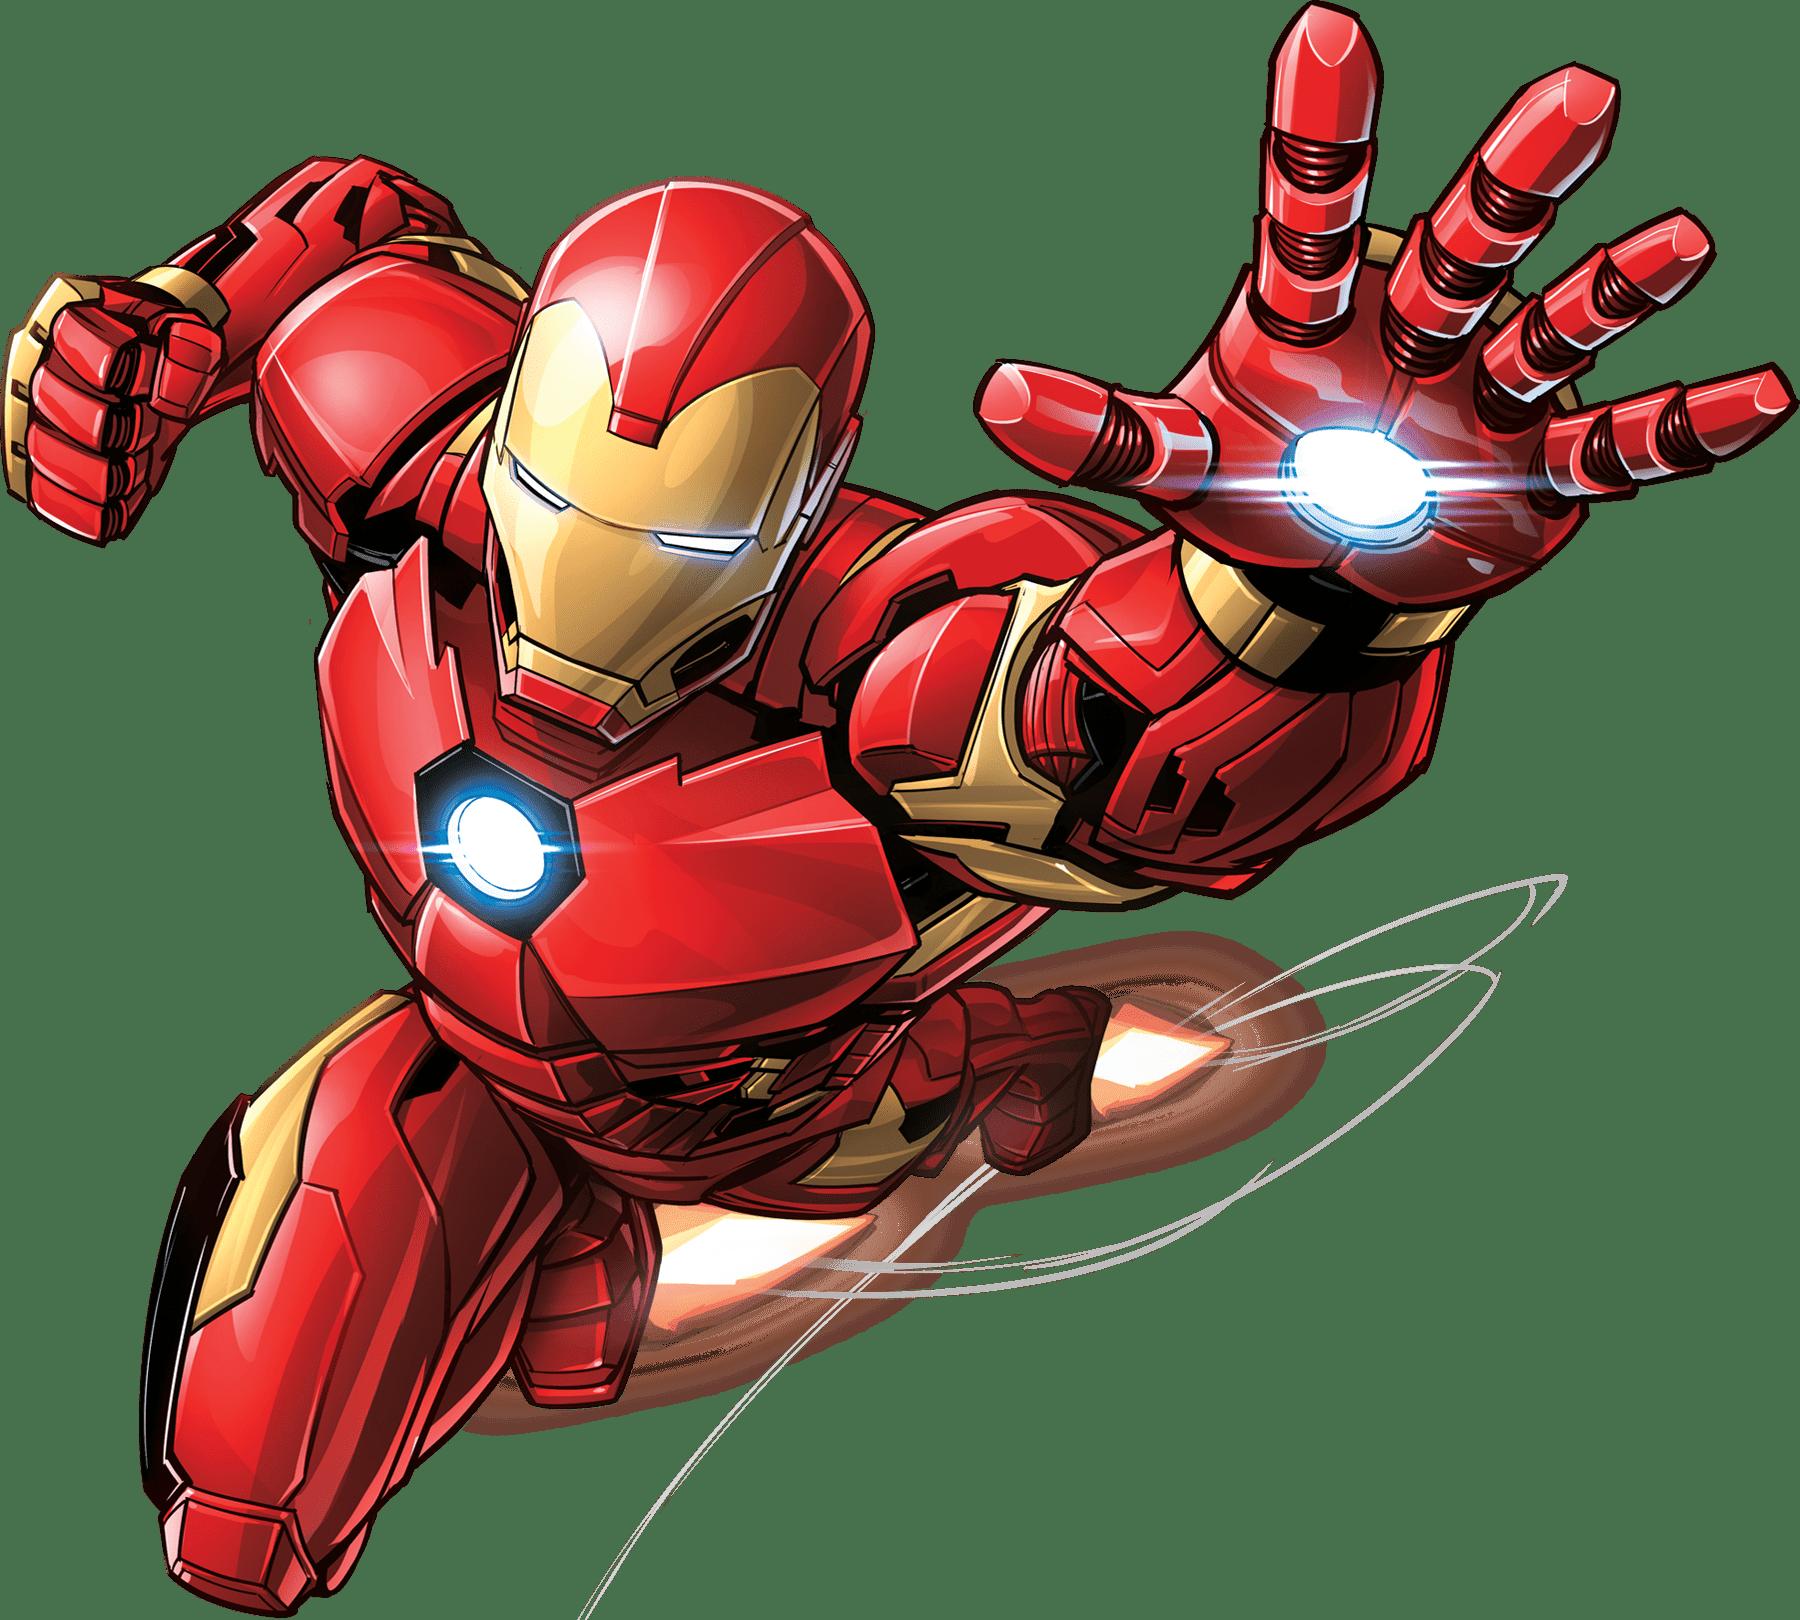 Flying Iron Man Png Hd , Transparent Cartoon - Jing.fm